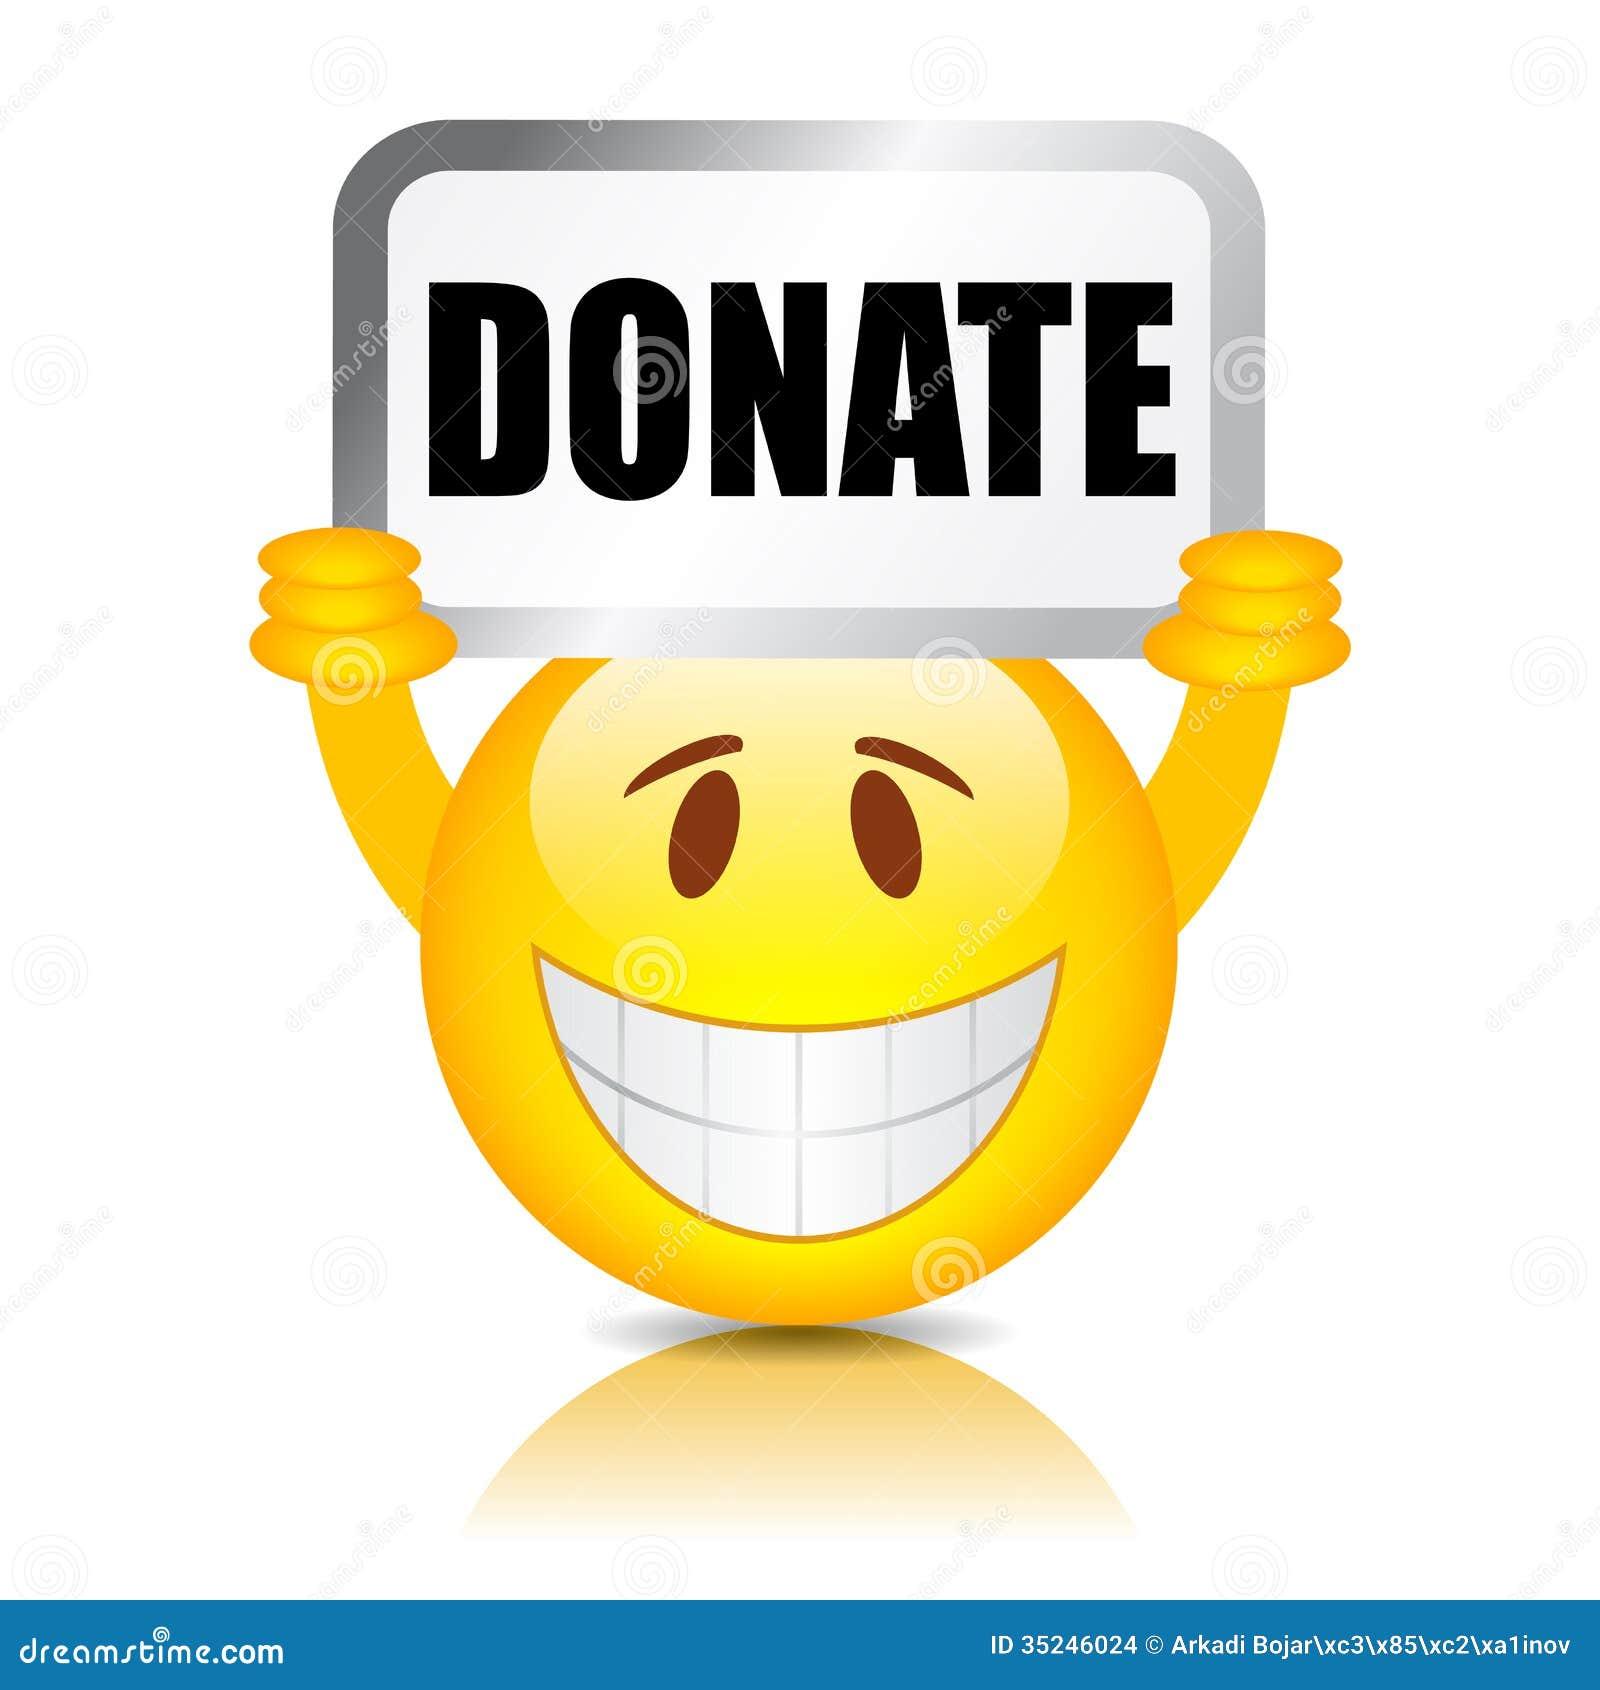 money donation clipart - photo #2